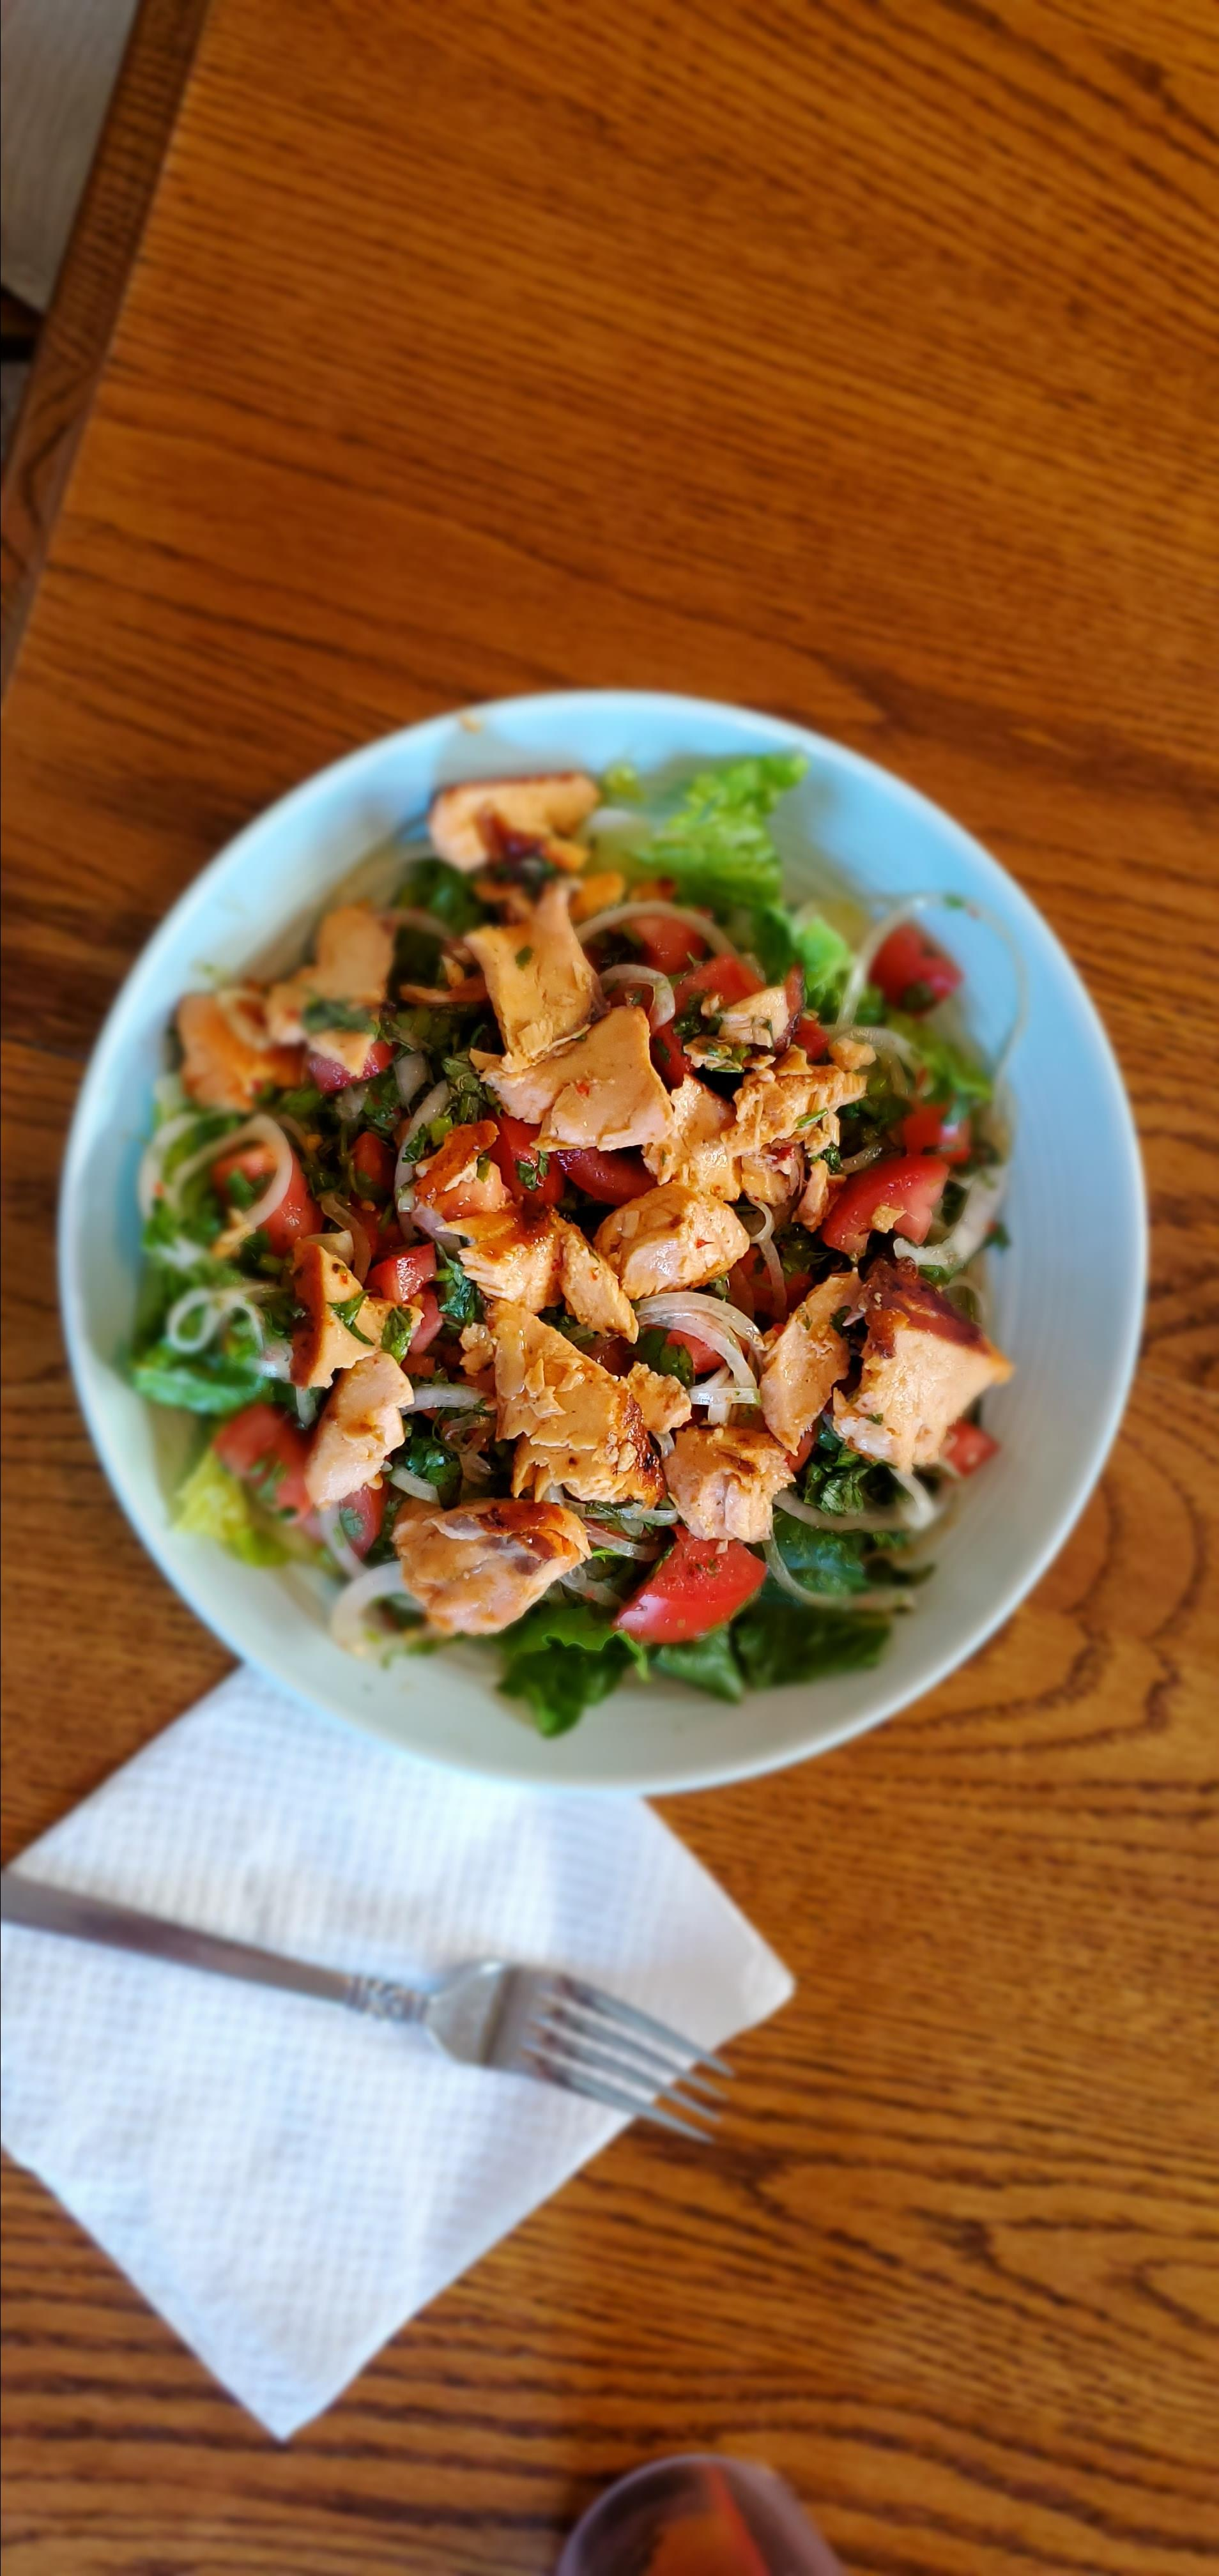 Lemon Blueberry Chicken Salad Dole